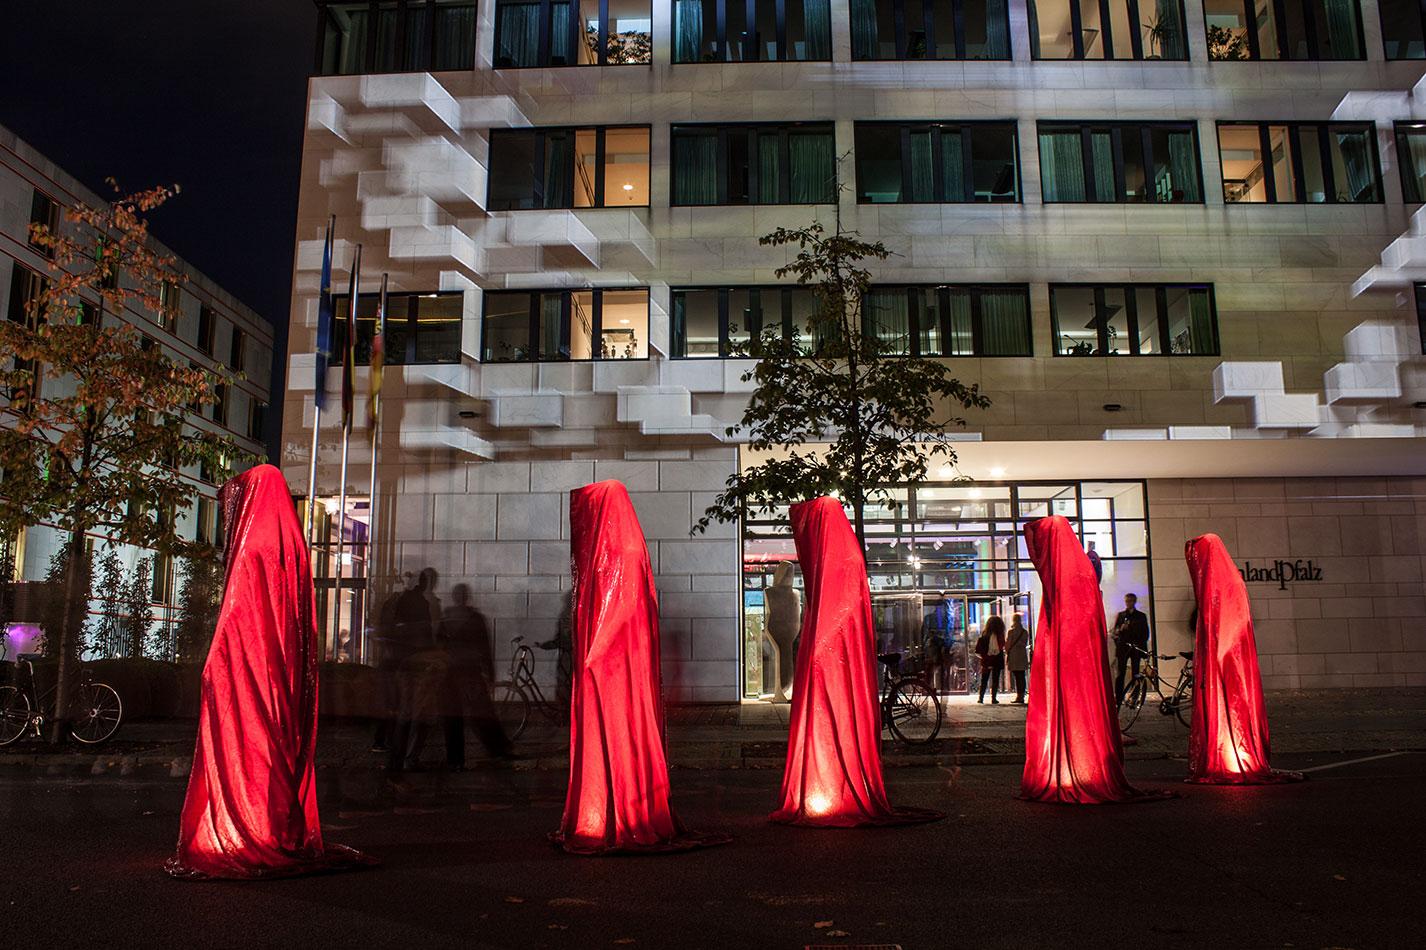 festival-of-lights-berlin-ministergaerten-light-art-festival-contemporary-fine-art-design-show-guardiansof-time-manfred-kili-kielnhofer-sculpture-3638